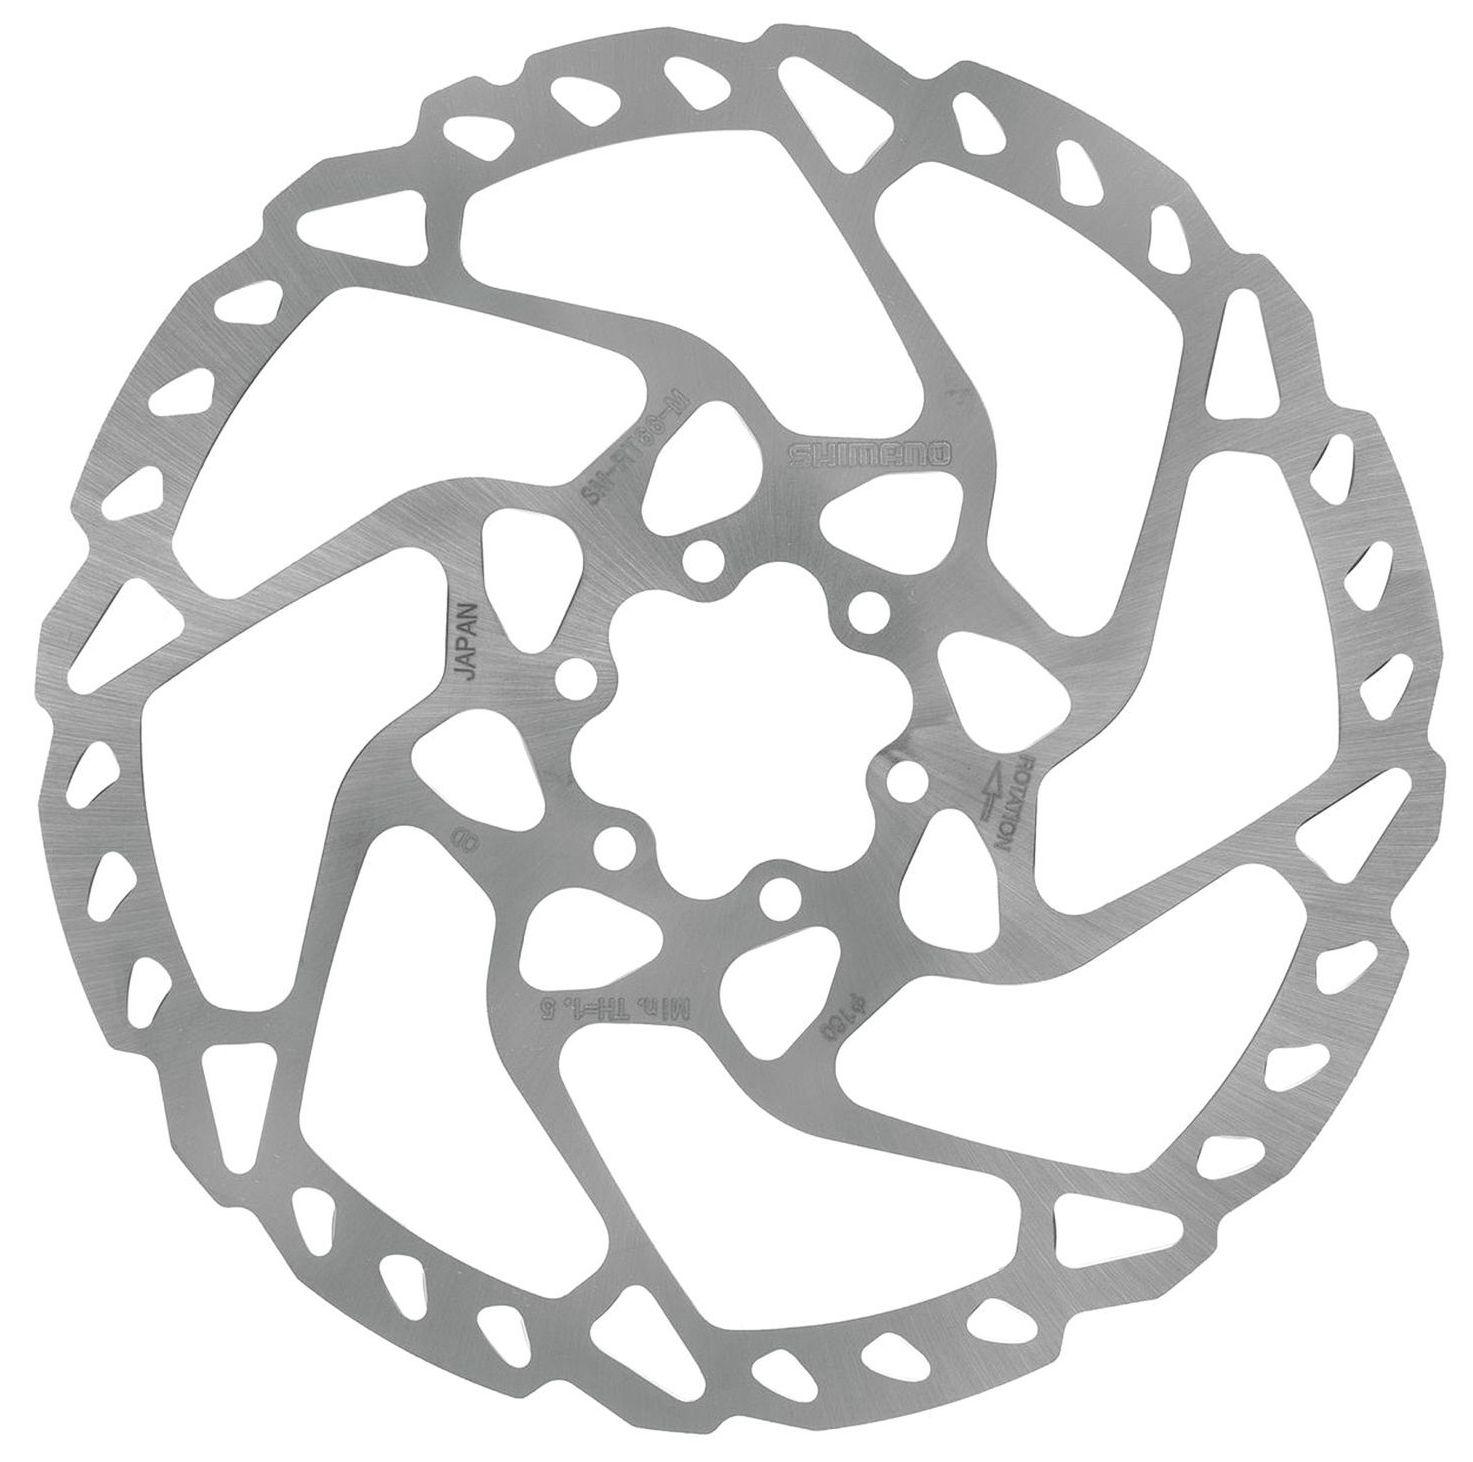 Товар Shimano RT66 (ISMRT66M),  тормоза и колодки  - артикул:286197